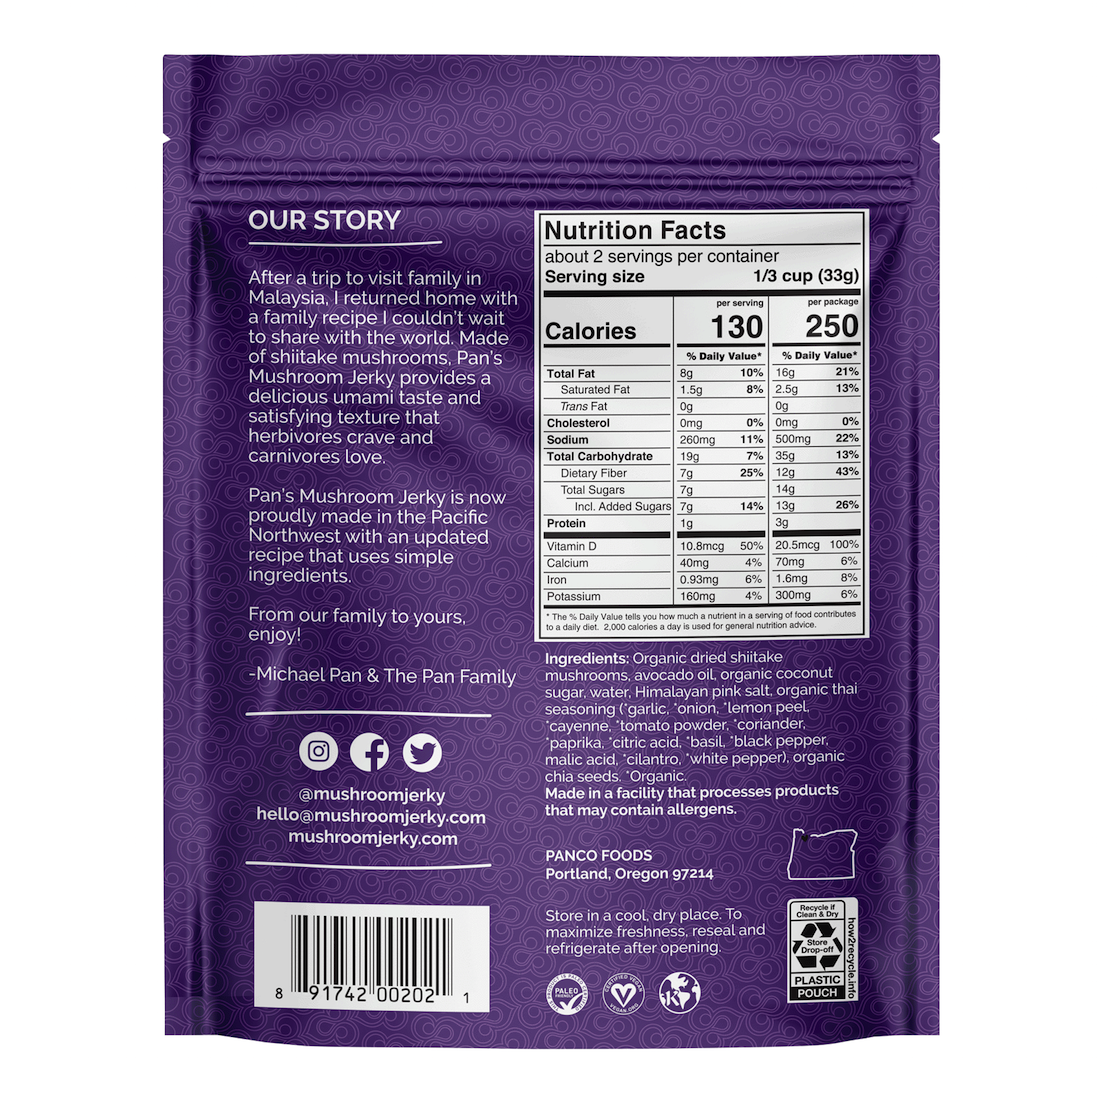 Zesty Thai NI - Pan's Mushroom Jerky - Certified Paleo Friendly, PaleoVegan by the Paleo Foundation